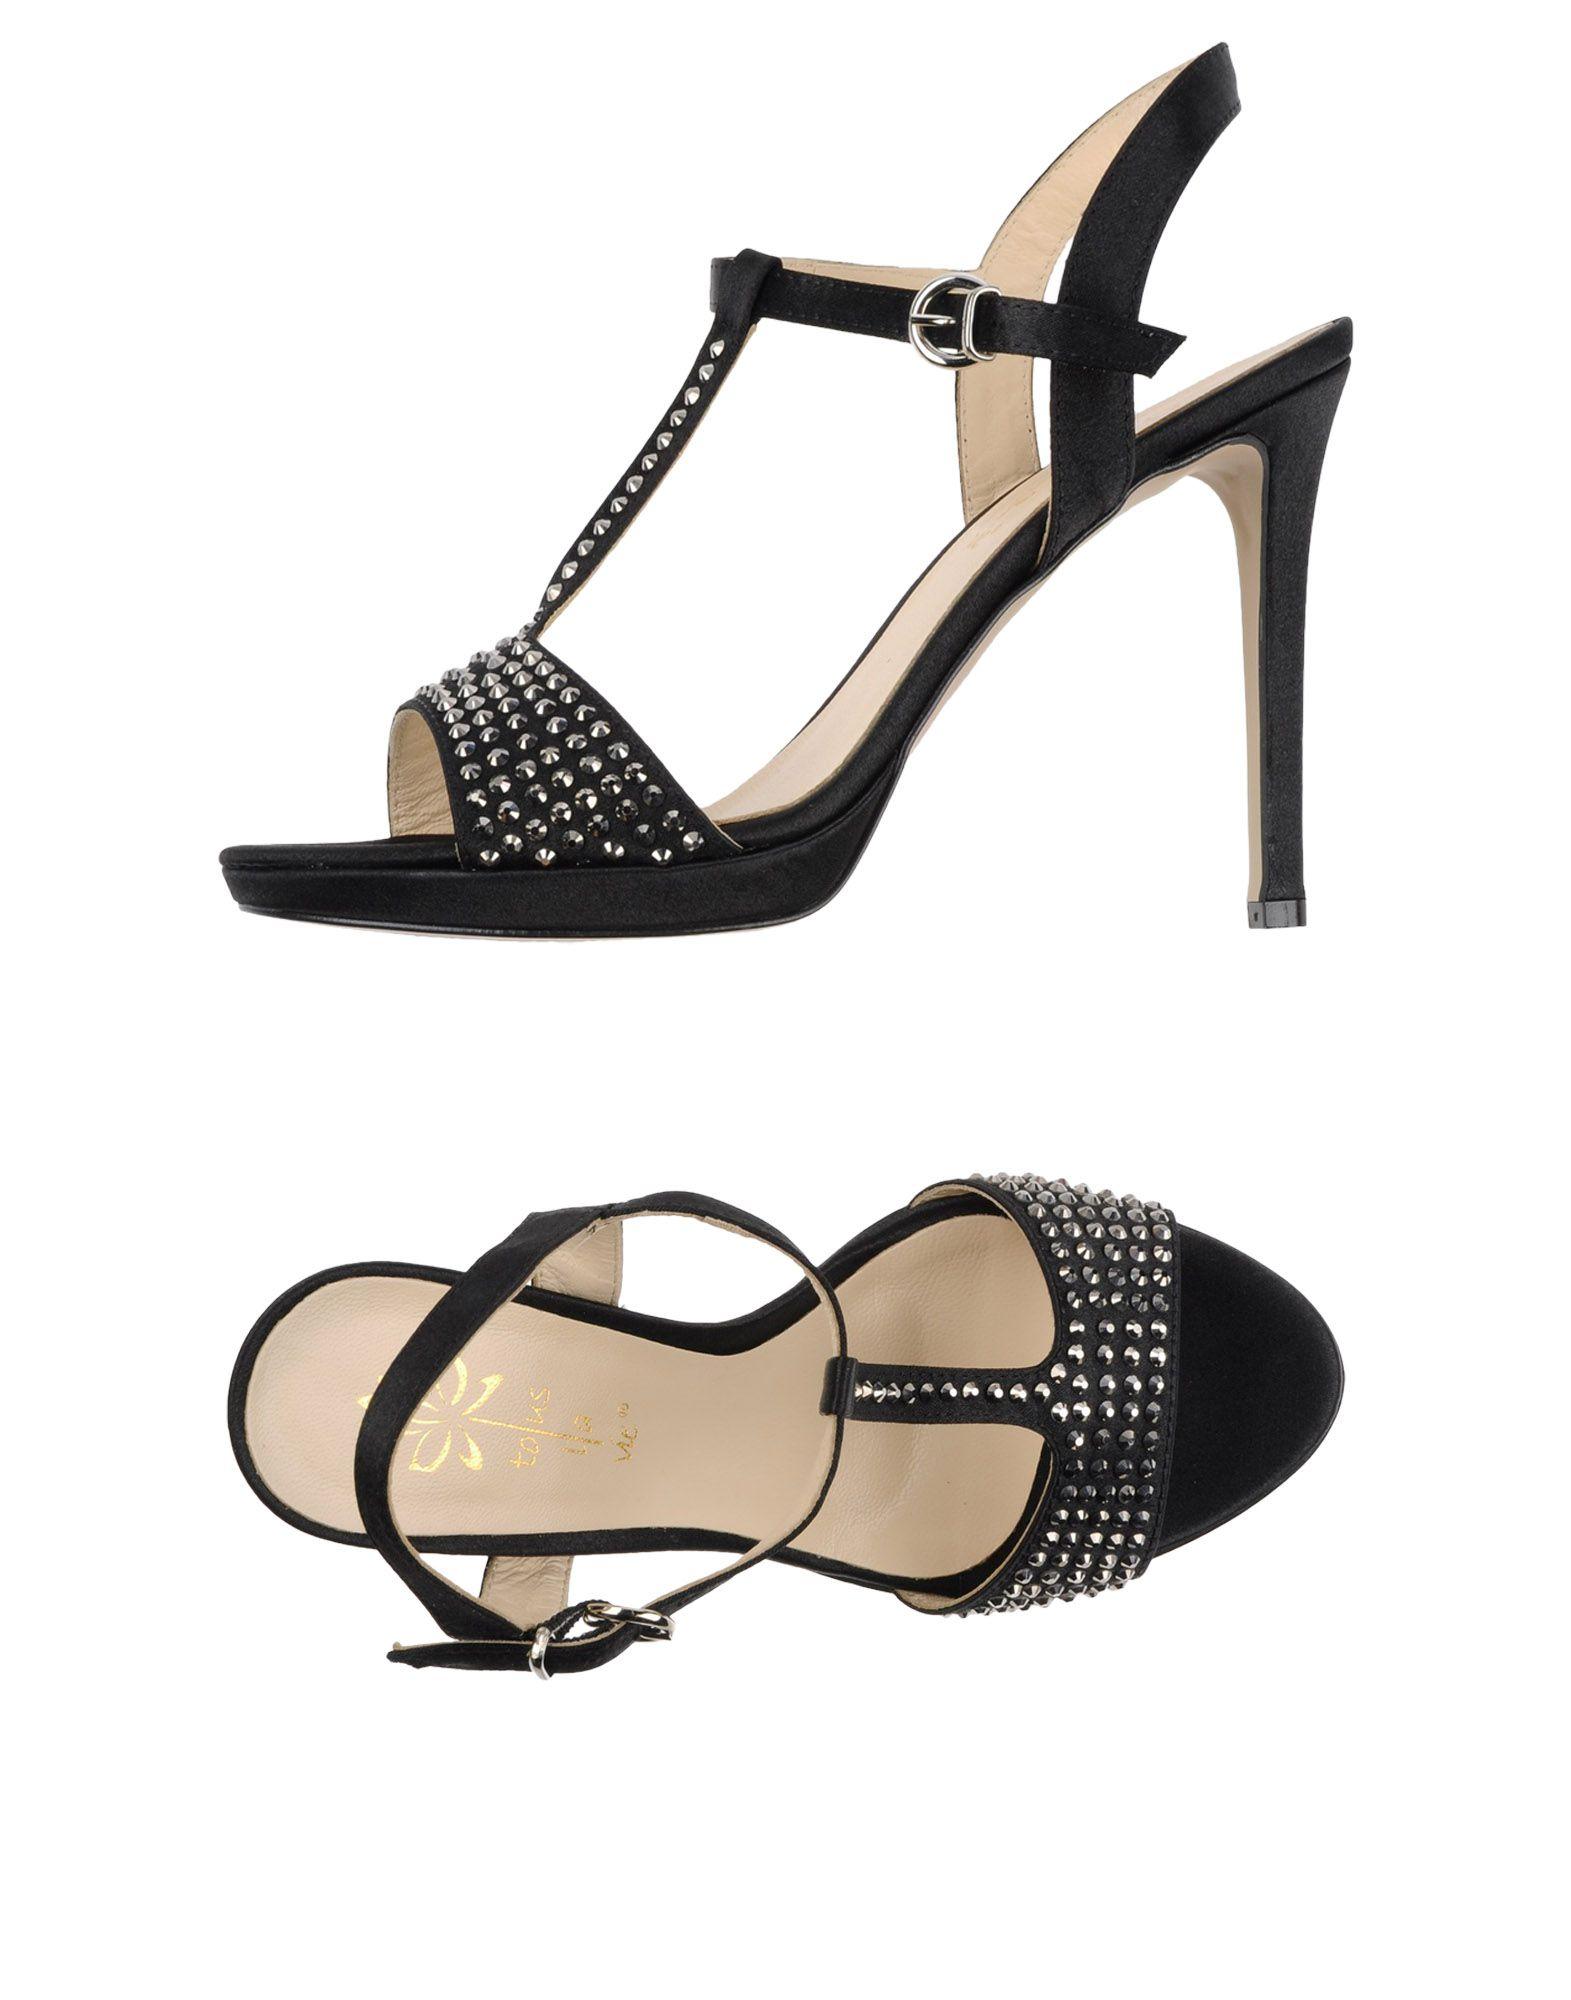 Stilvolle billige Schuhe Damen Tous La Víe Sandalen Damen Schuhe  11110408EH ae1dcb